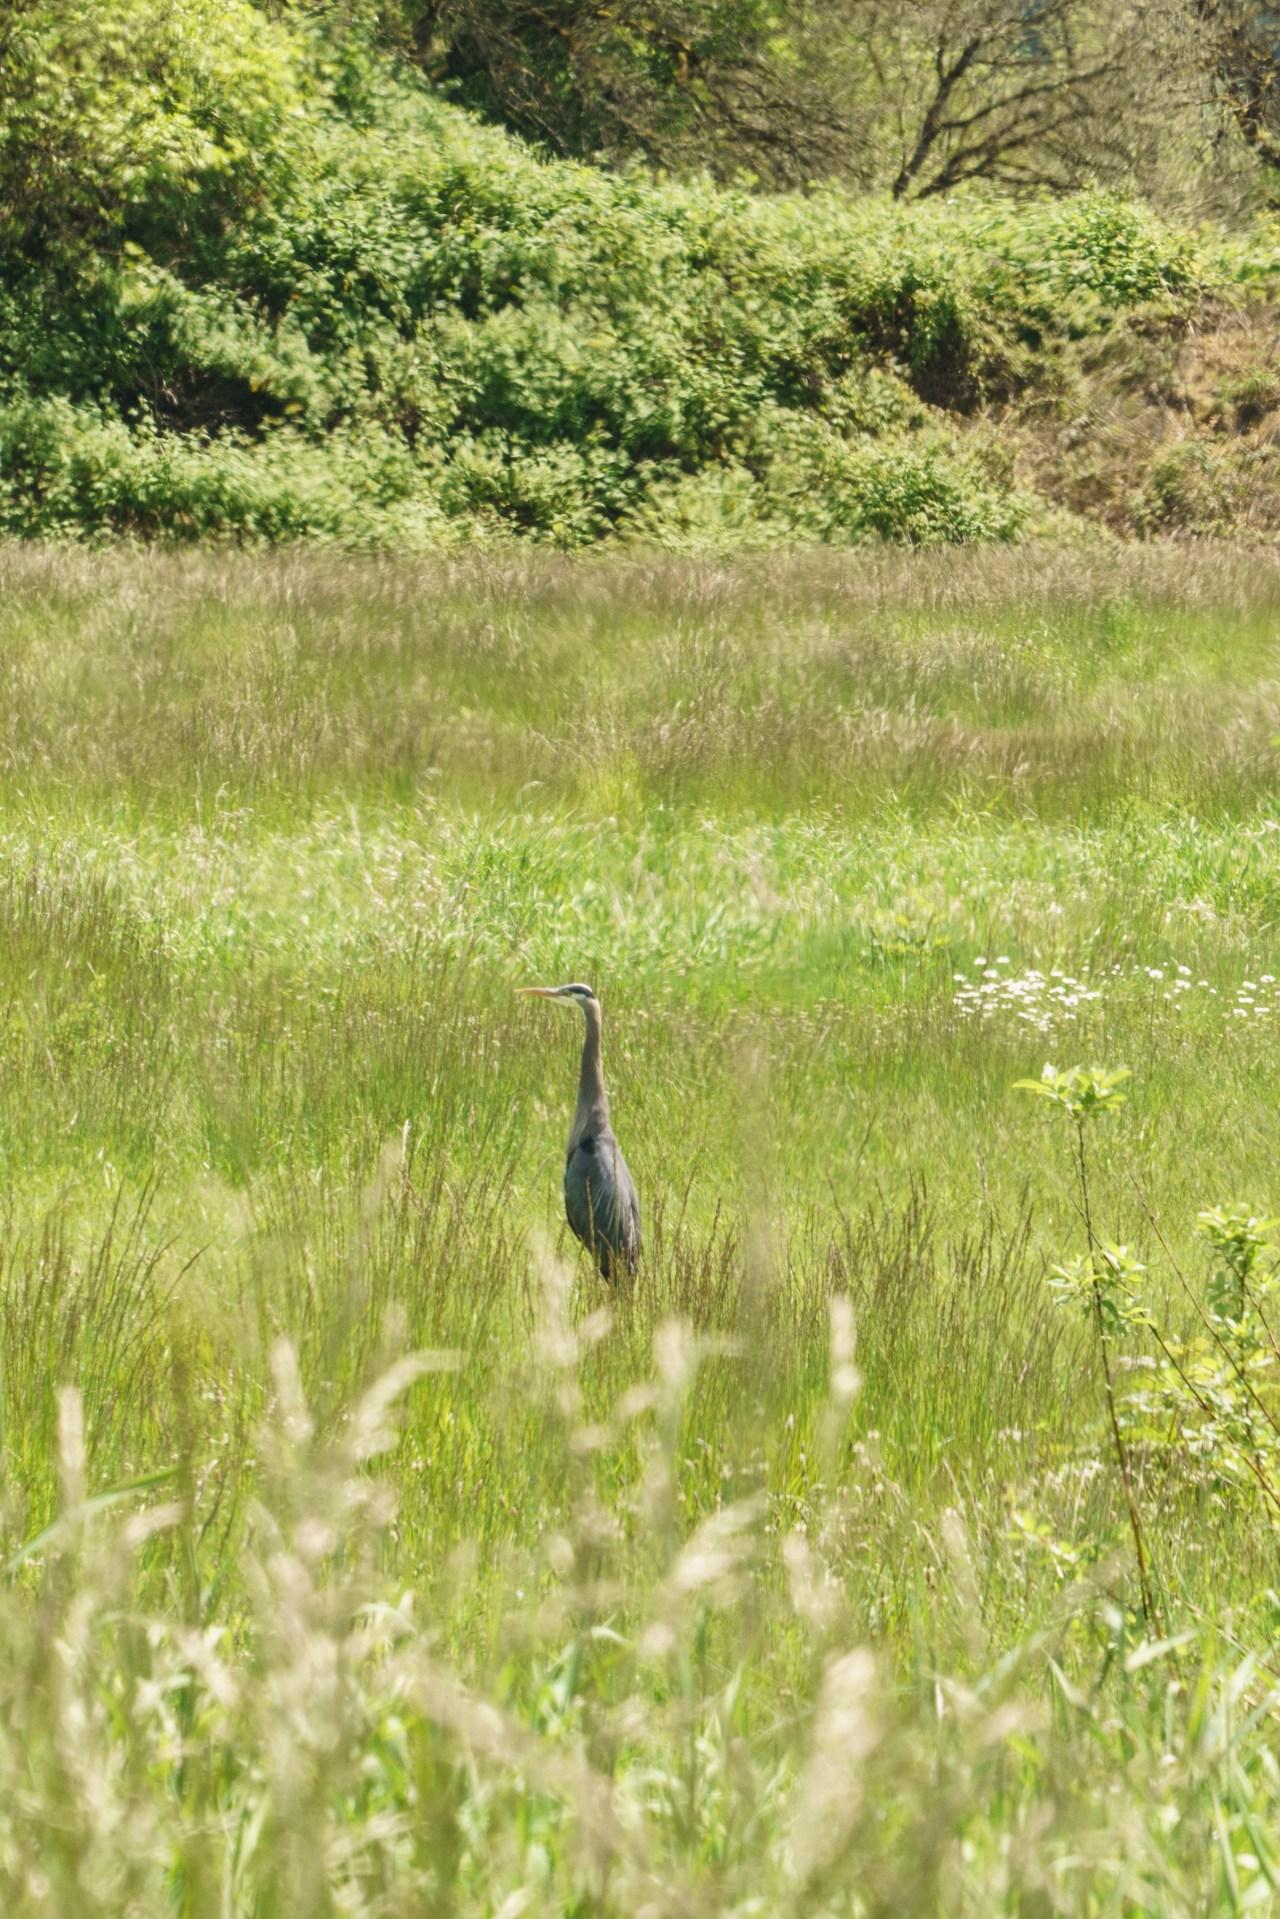 Great blue heron at the Ridgefield Bird Sanctuary